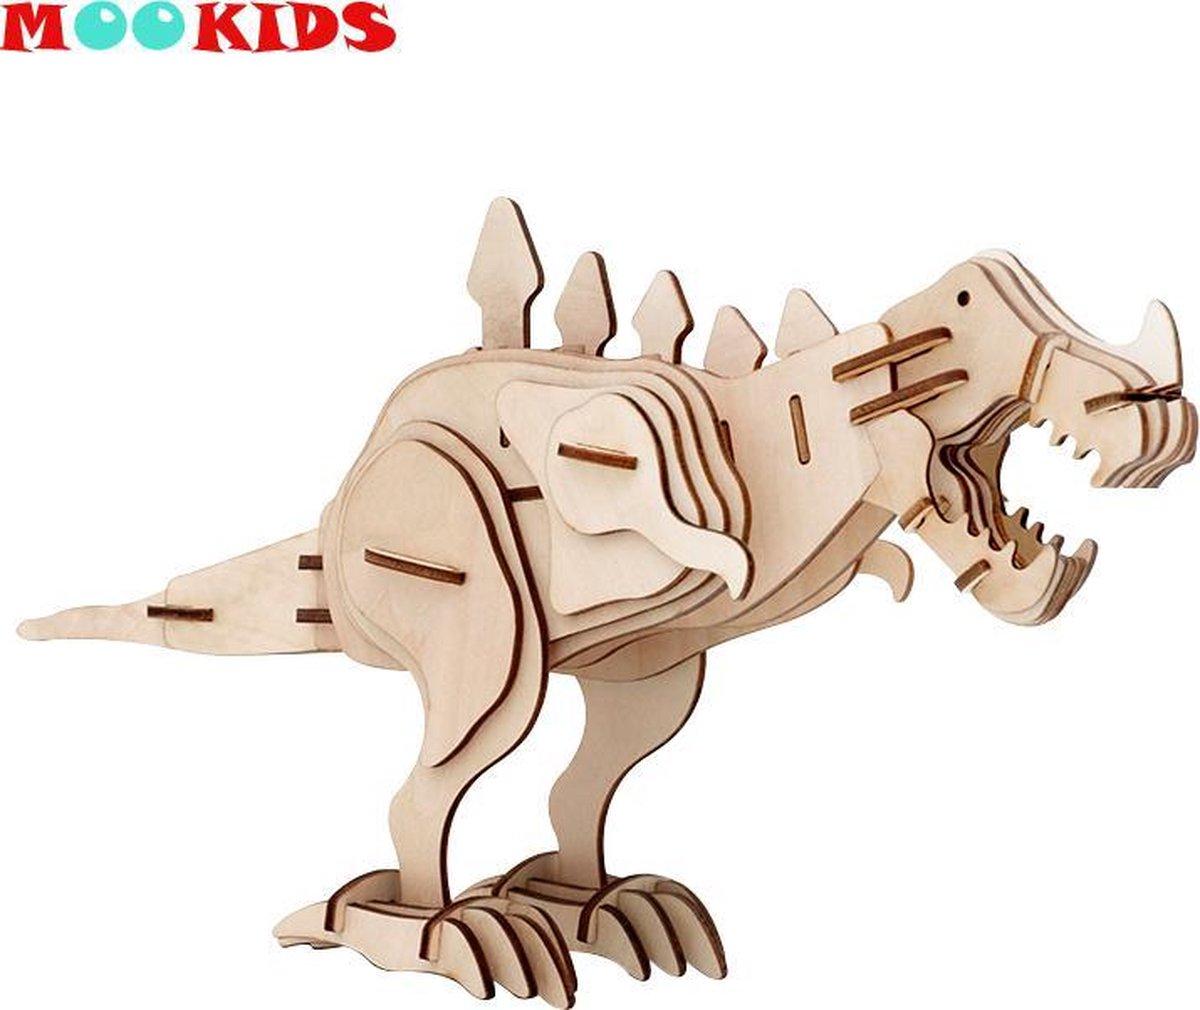 Mookids - Modelbouw Hout - 3D Puzzel - Tyrannosaurus Rex - 67 Stukken